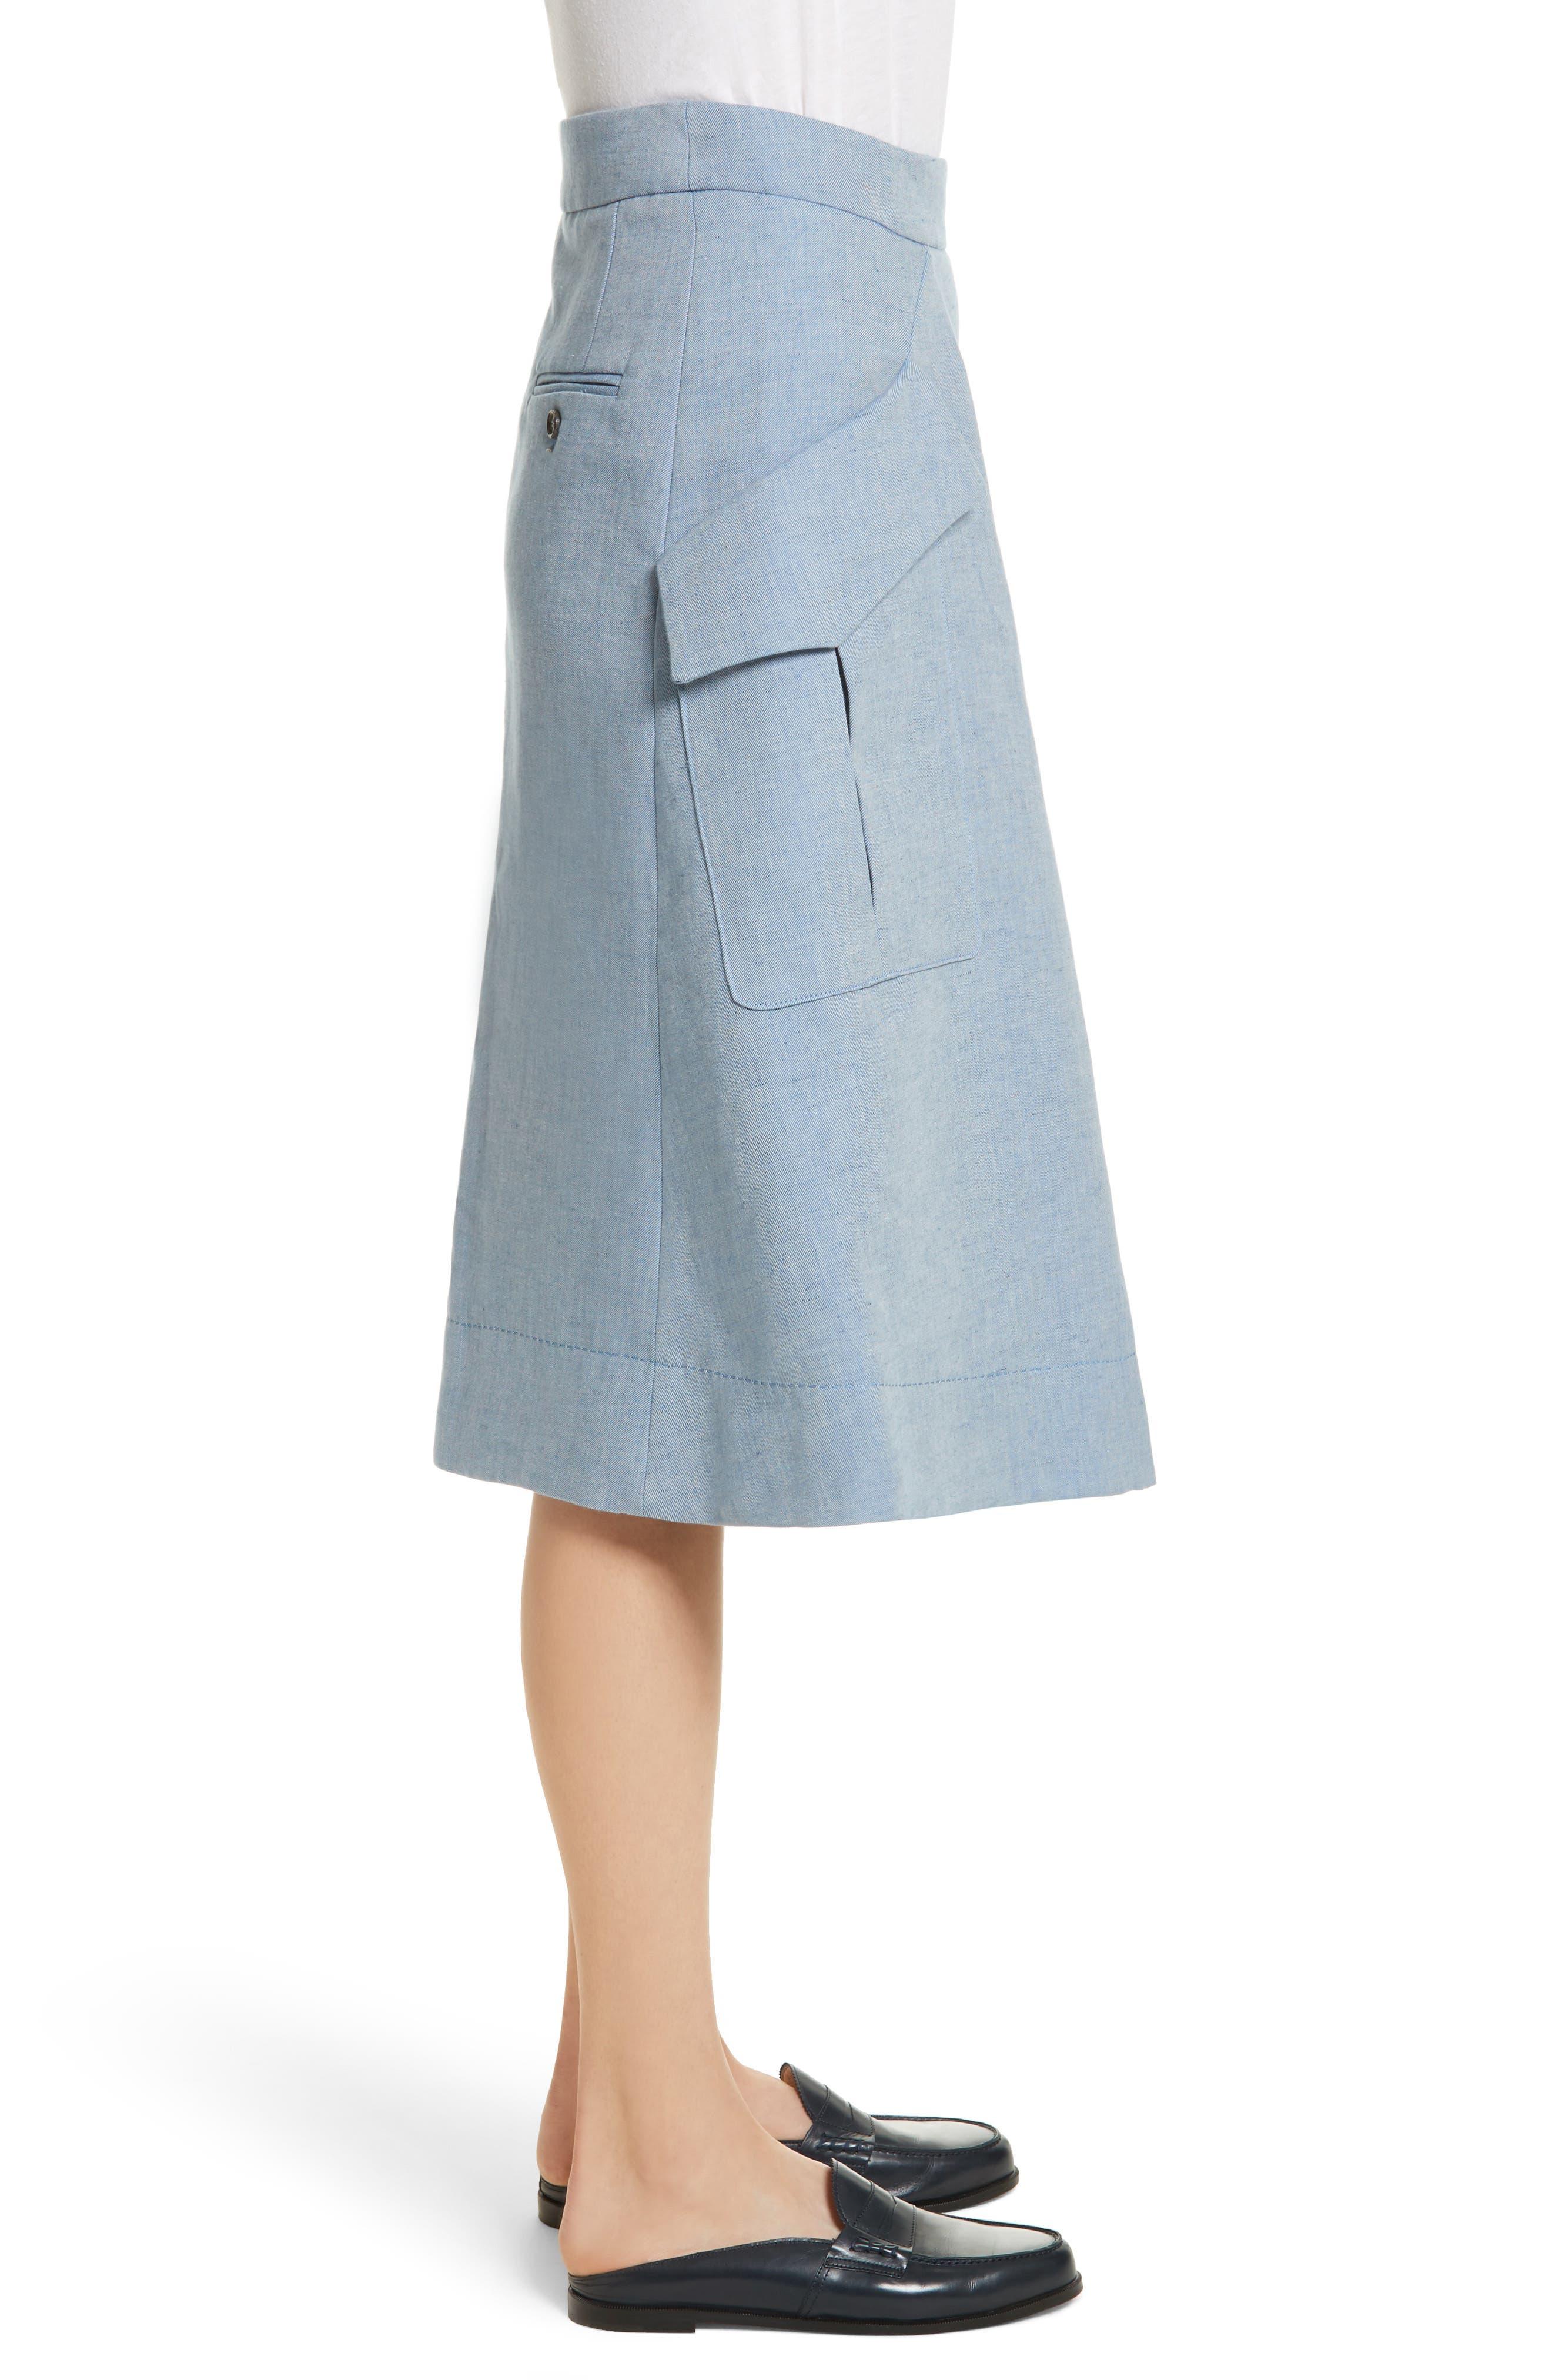 Jupe Genou Skirt,                             Alternate thumbnail 3, color,                             Bleu Acier